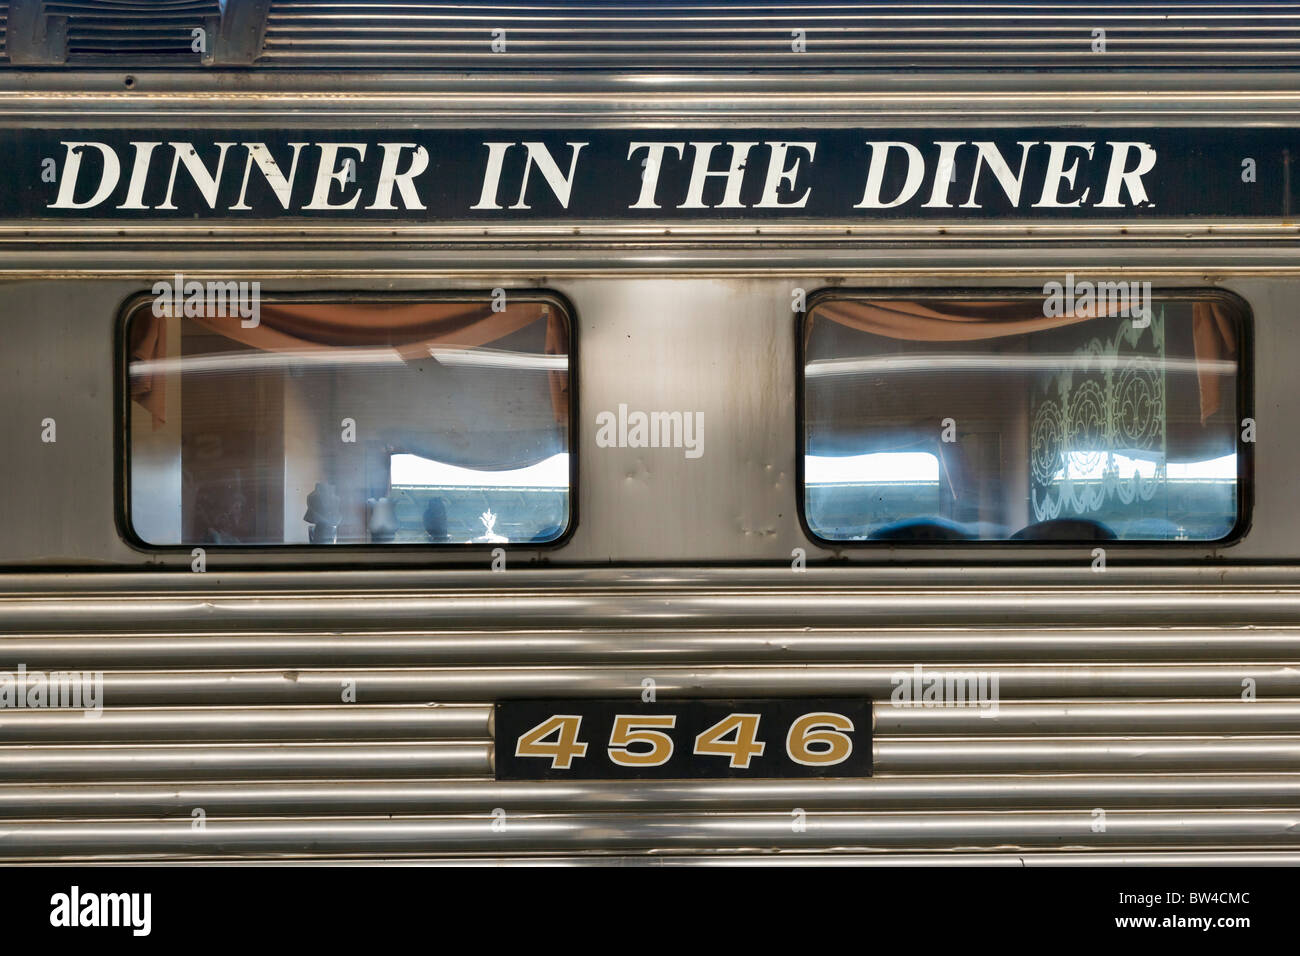 dining car on the chattanooga choo choo train now a hotel restaurant BW4CMC - Chattanooga Choo Choo Gardens Restaurant Menu